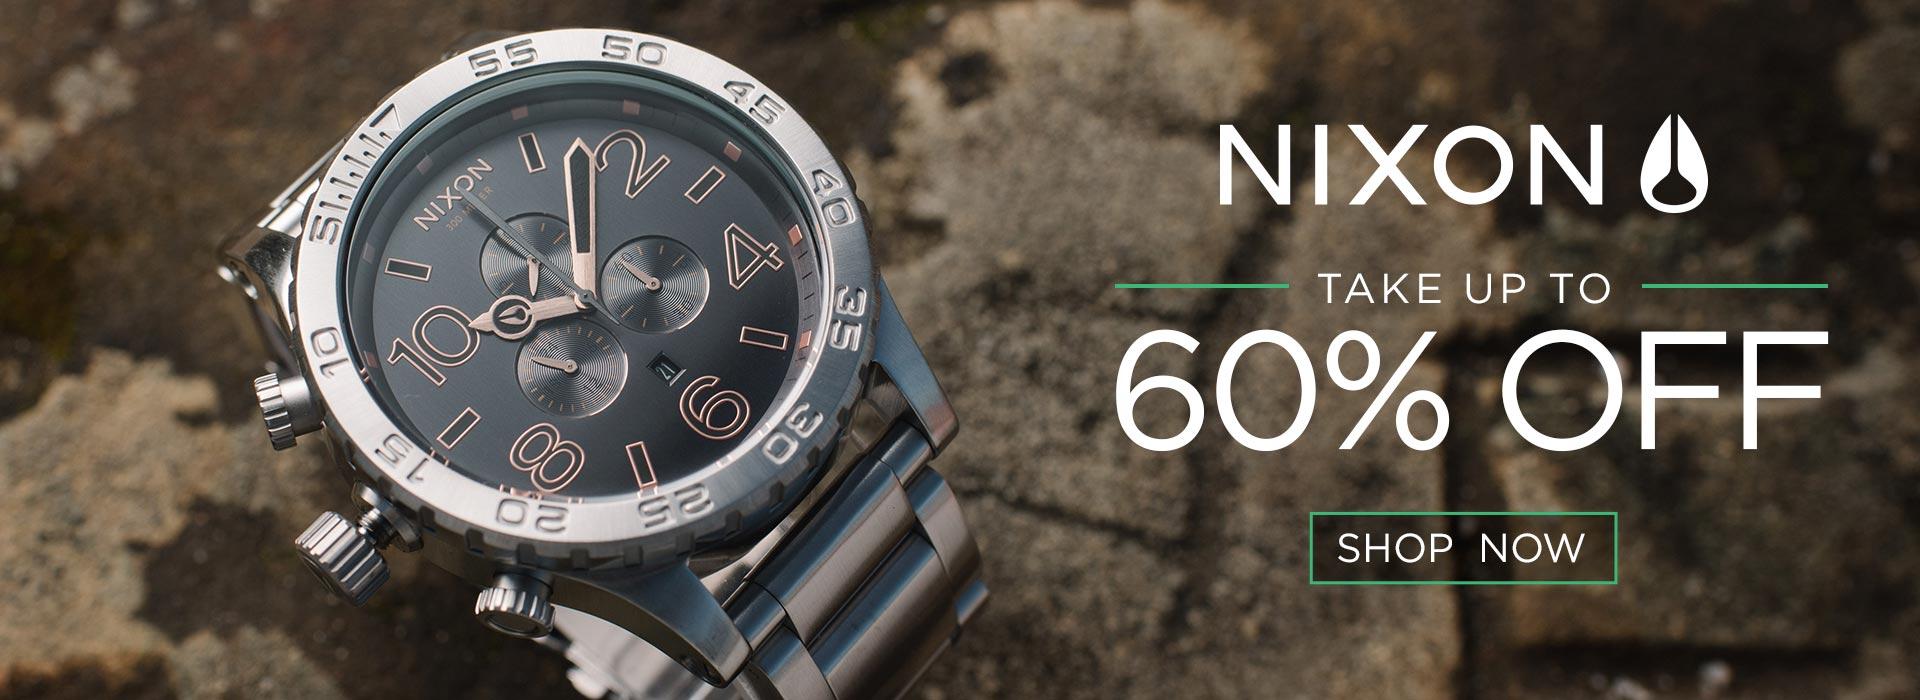 Nixon Watches 51-30 on Sale